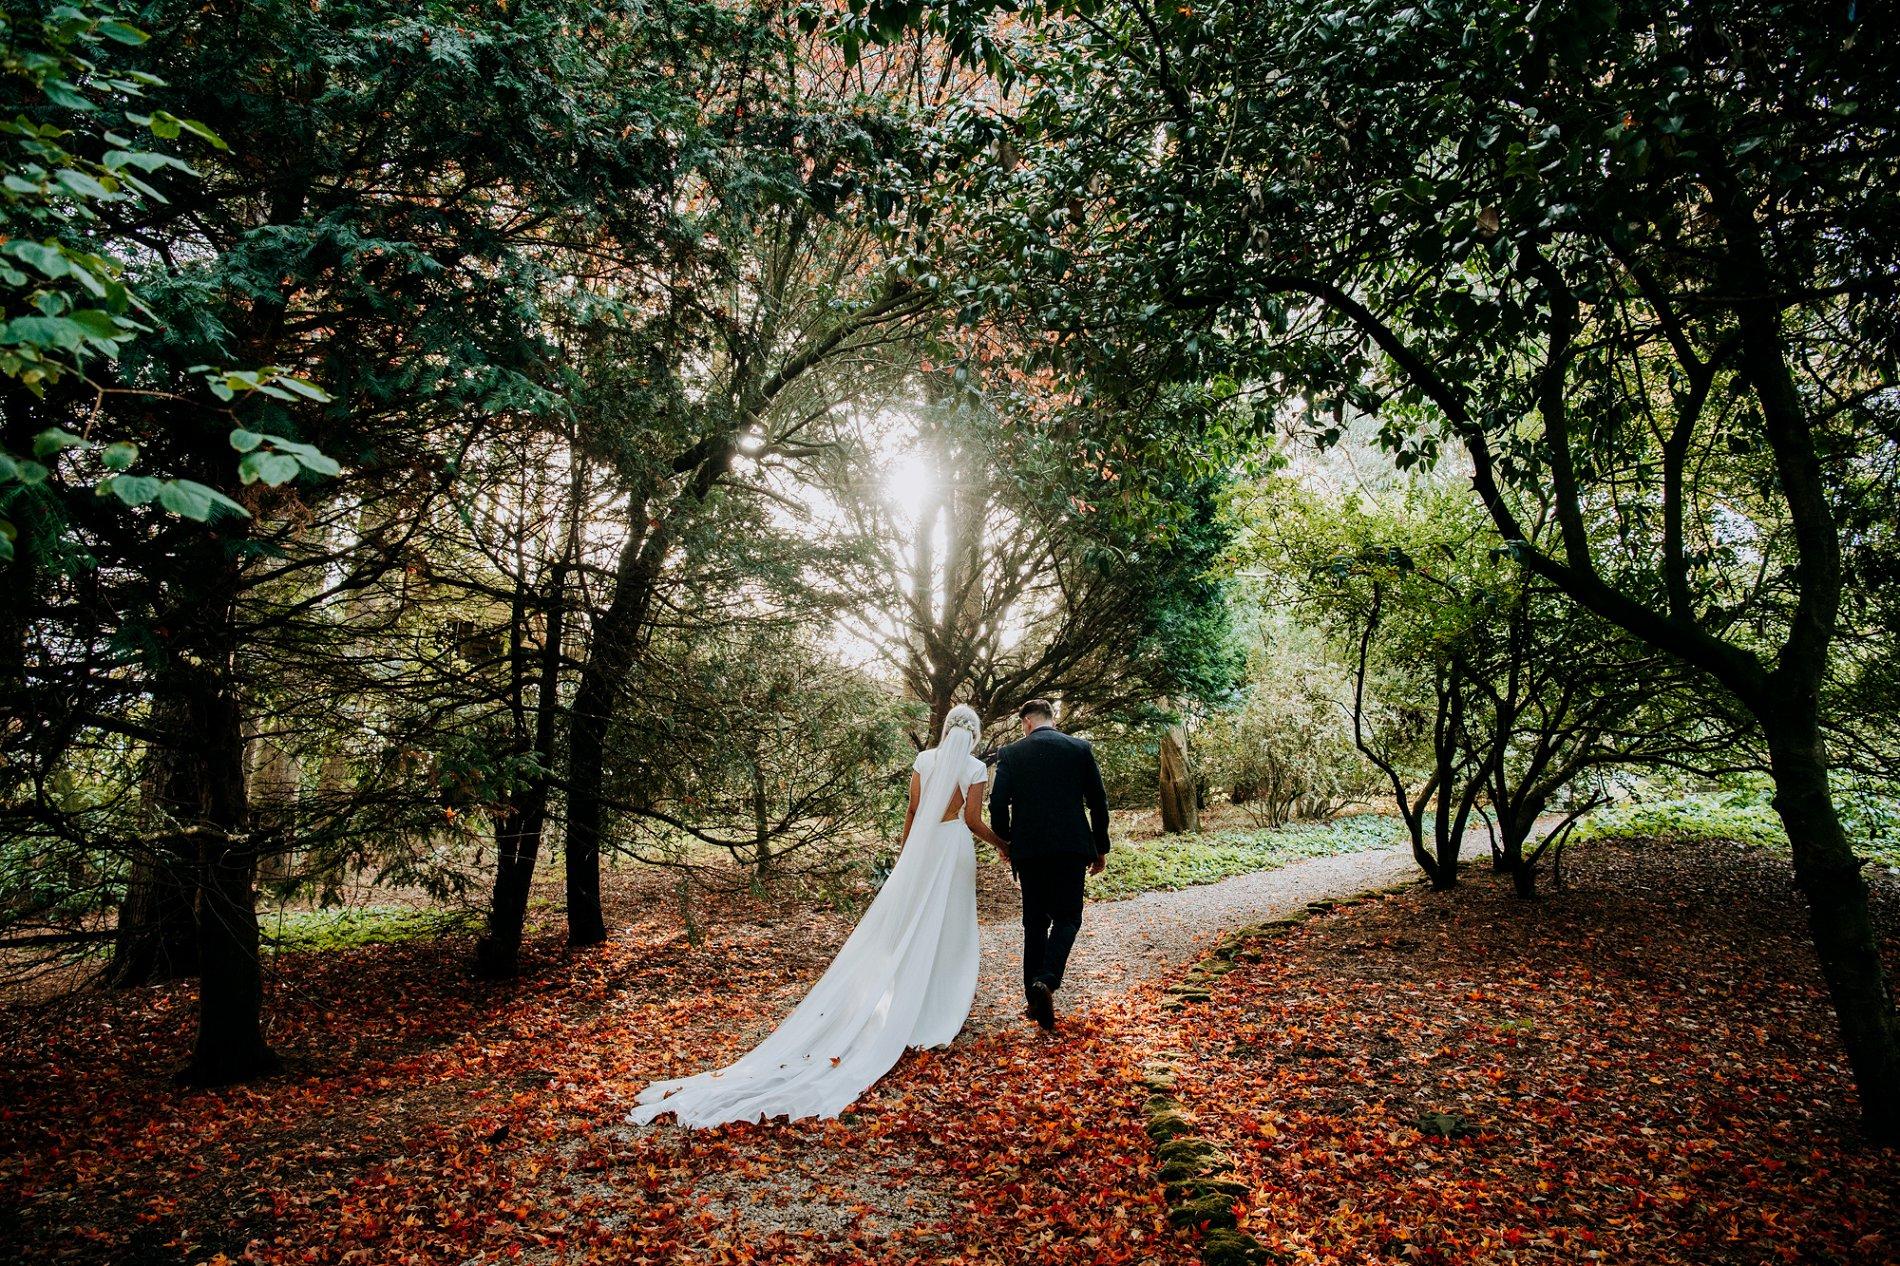 M & G Wedding Photography (7)